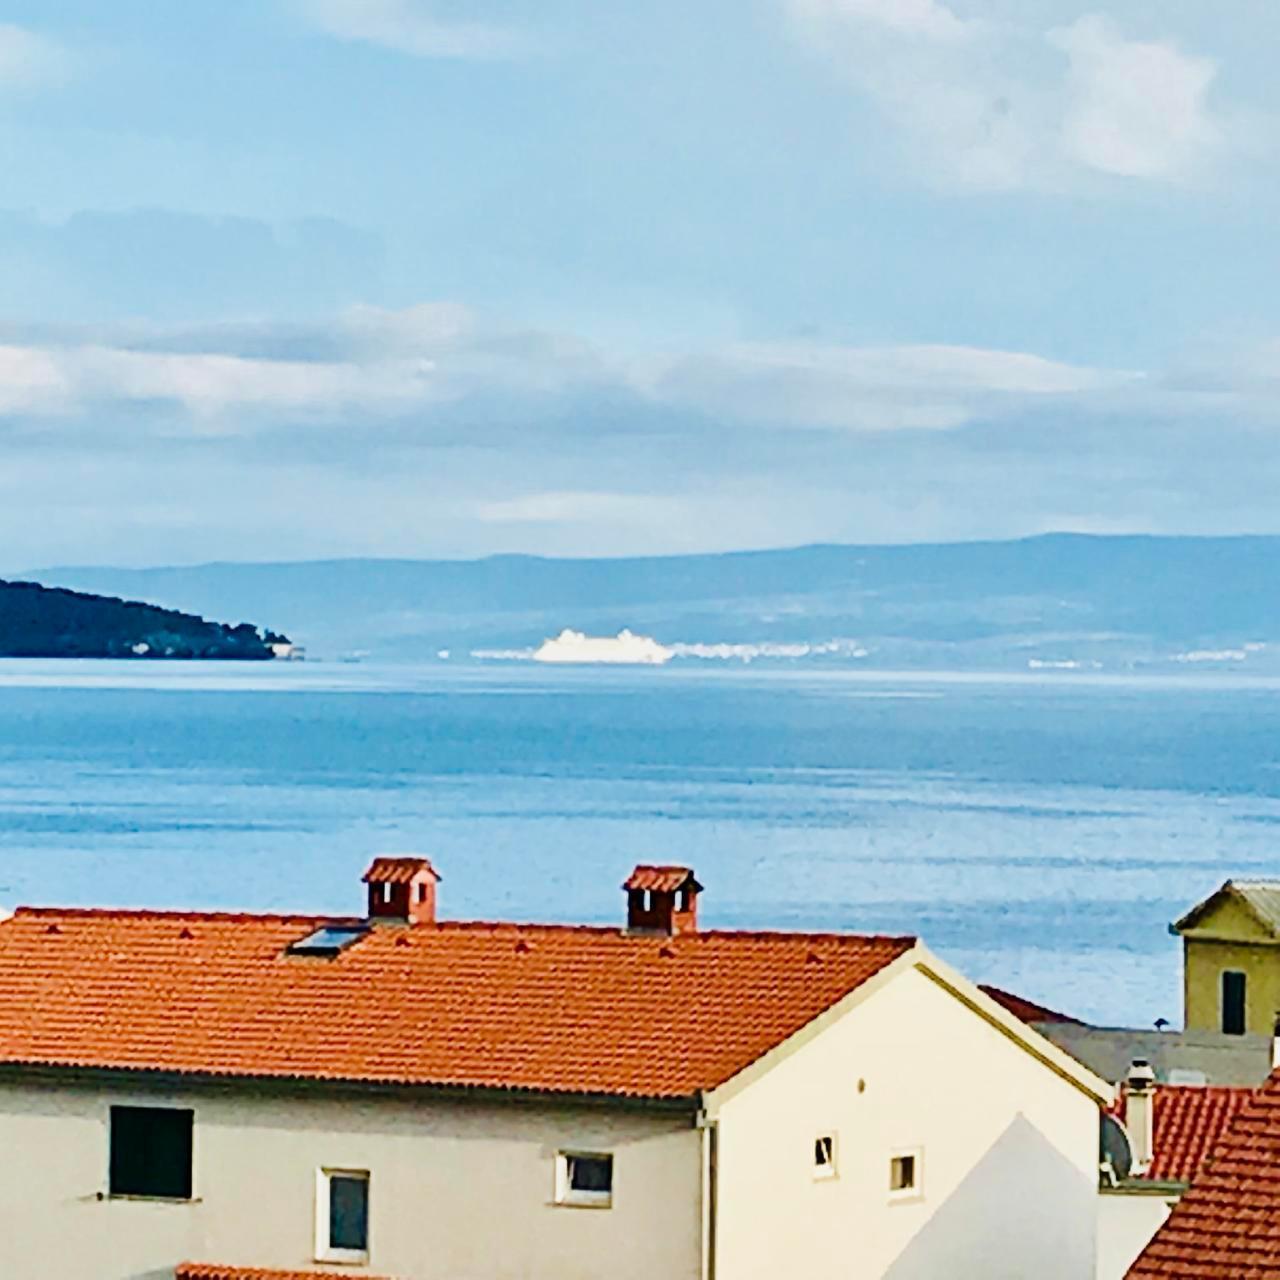 Ferienwohnung Apartmenthaus Ruza 6 - Apartment (98382), Kaštel Štafilić, , Dalmatien, Kroatien, Bild 35